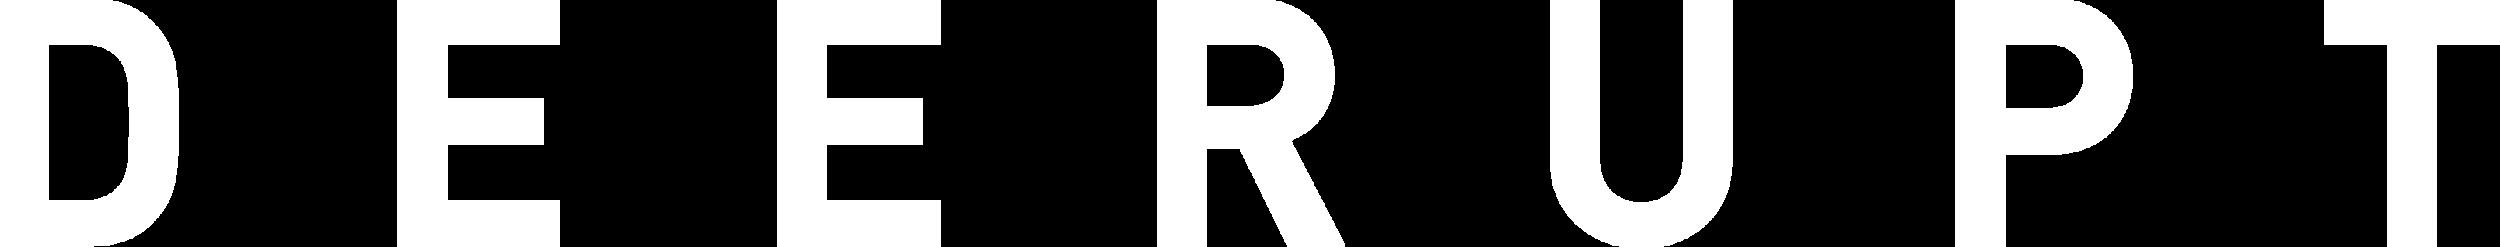 Deerupt-Logo.png